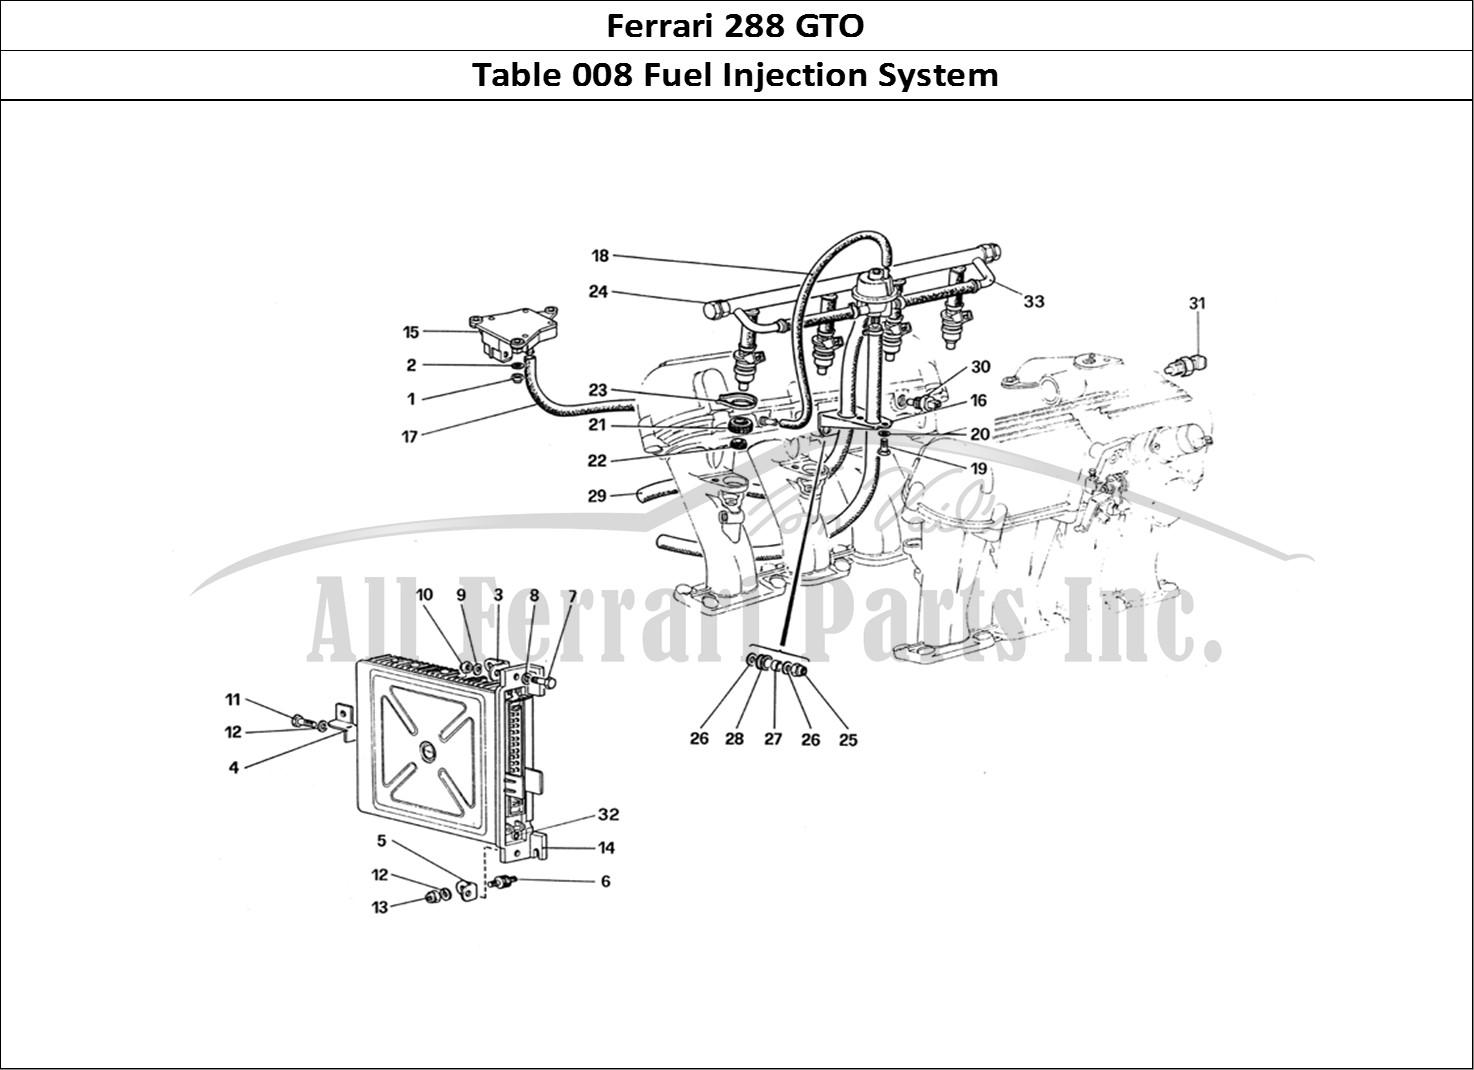 Buy Original Ferrari 288 Gto 008 Fuel Injection System